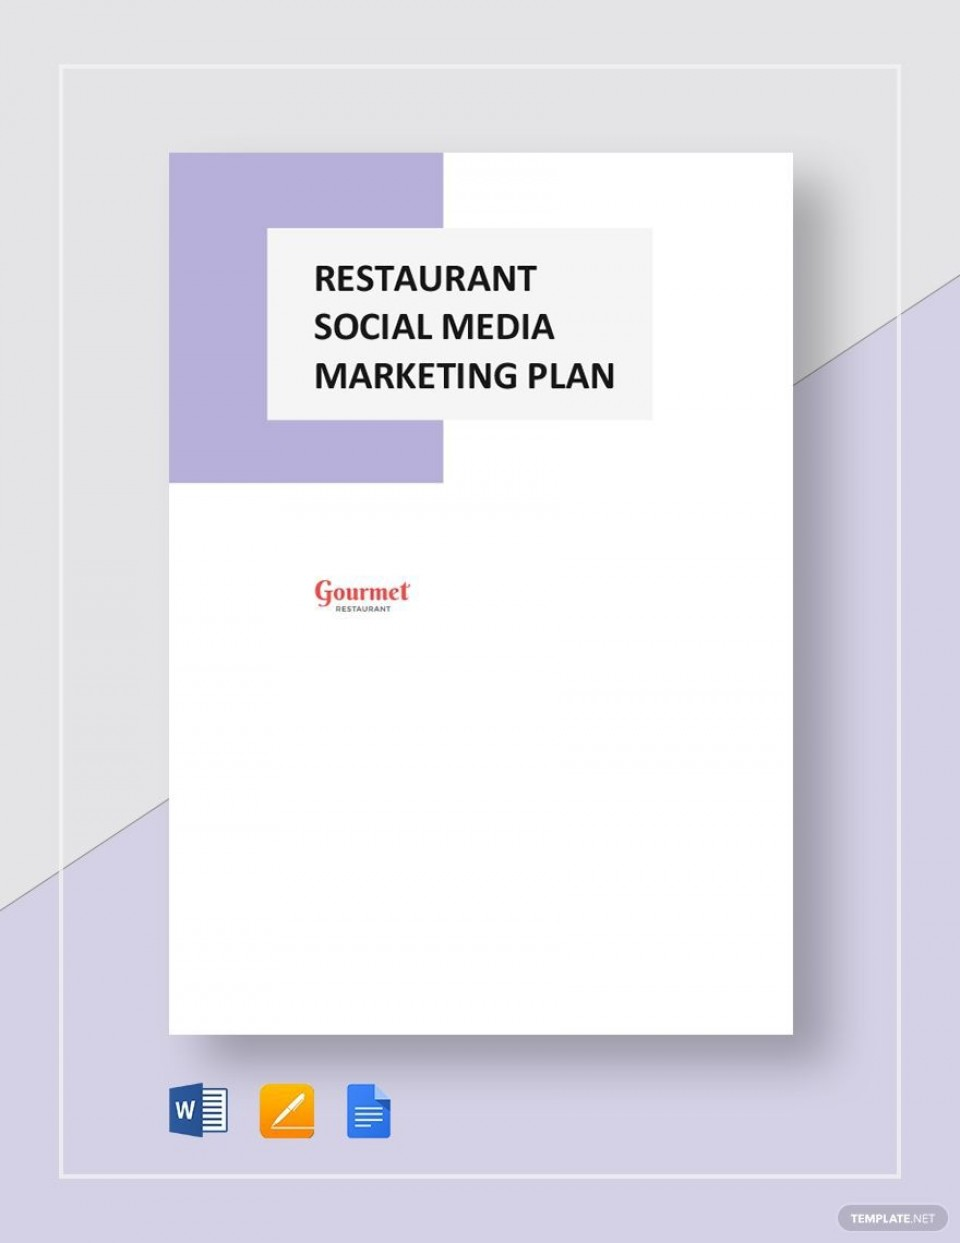 004 Impressive Social Media Marketing Plan Template Doc Highest Clarity 960